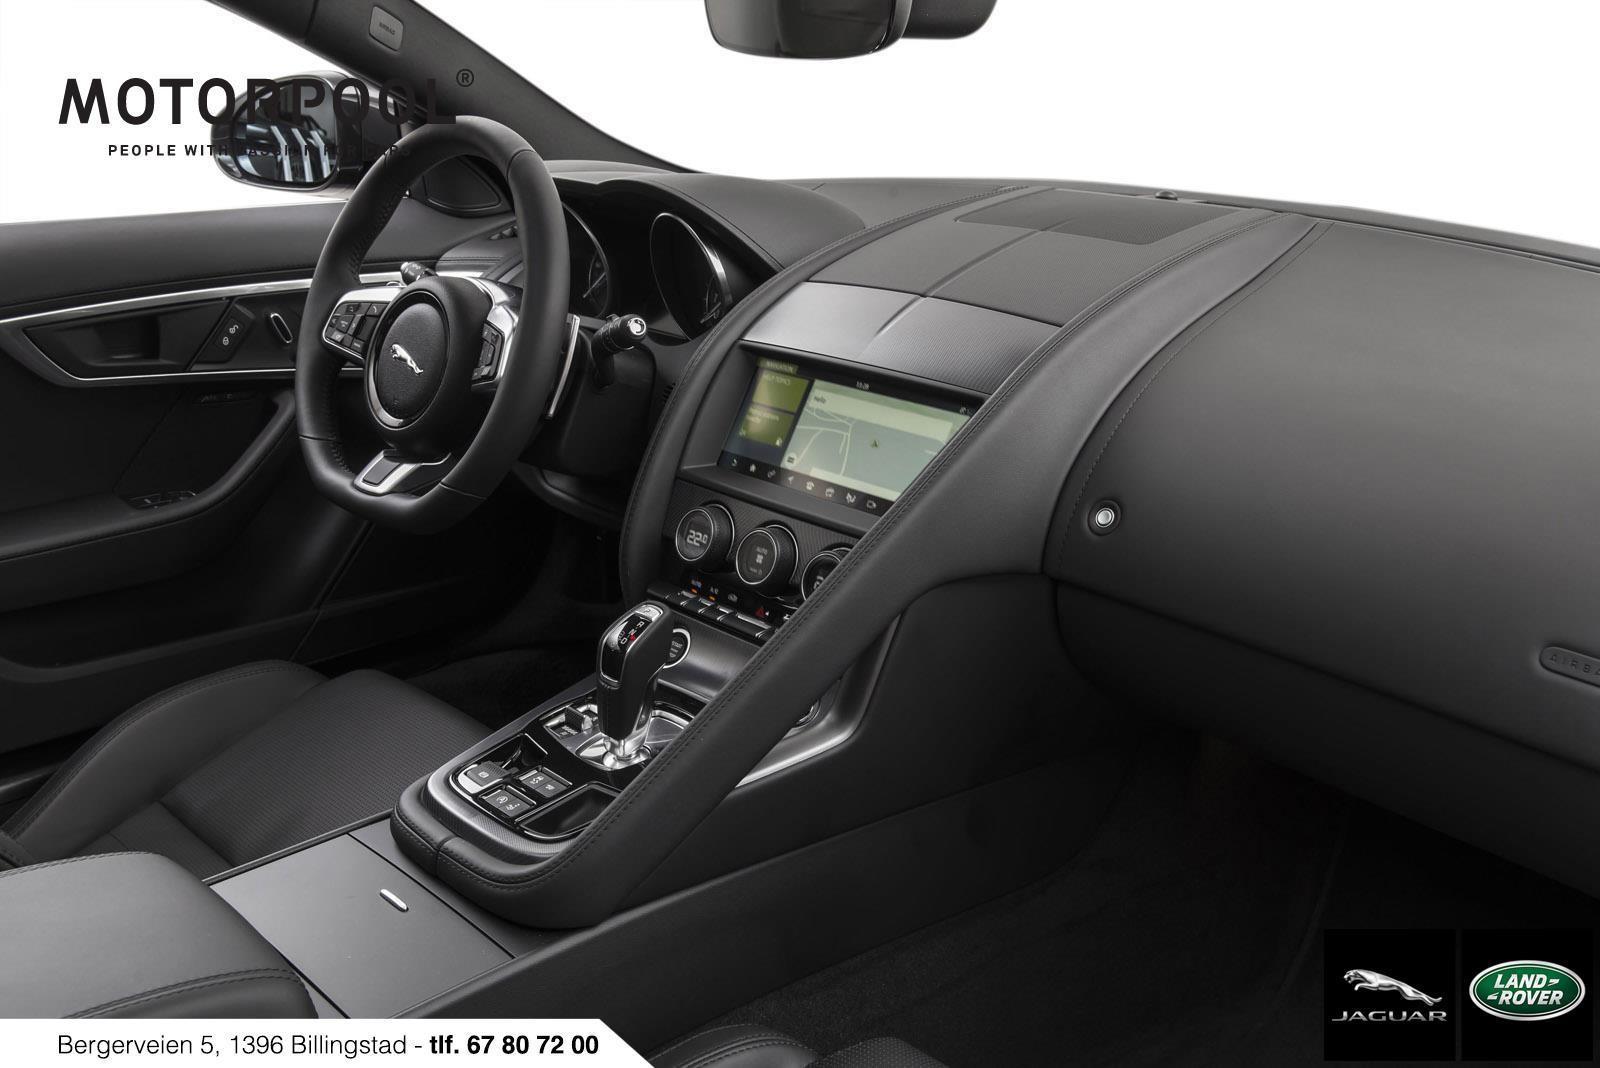 Bruktbil Jaguar F Type 2019 50km Motorpool